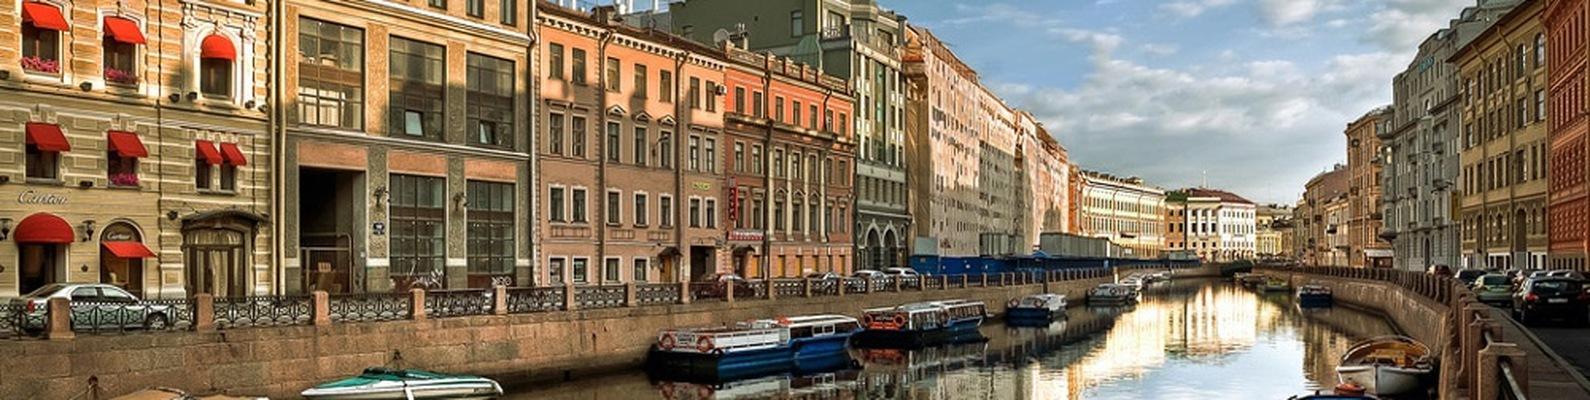 мини отель вид на неву санкт петербург